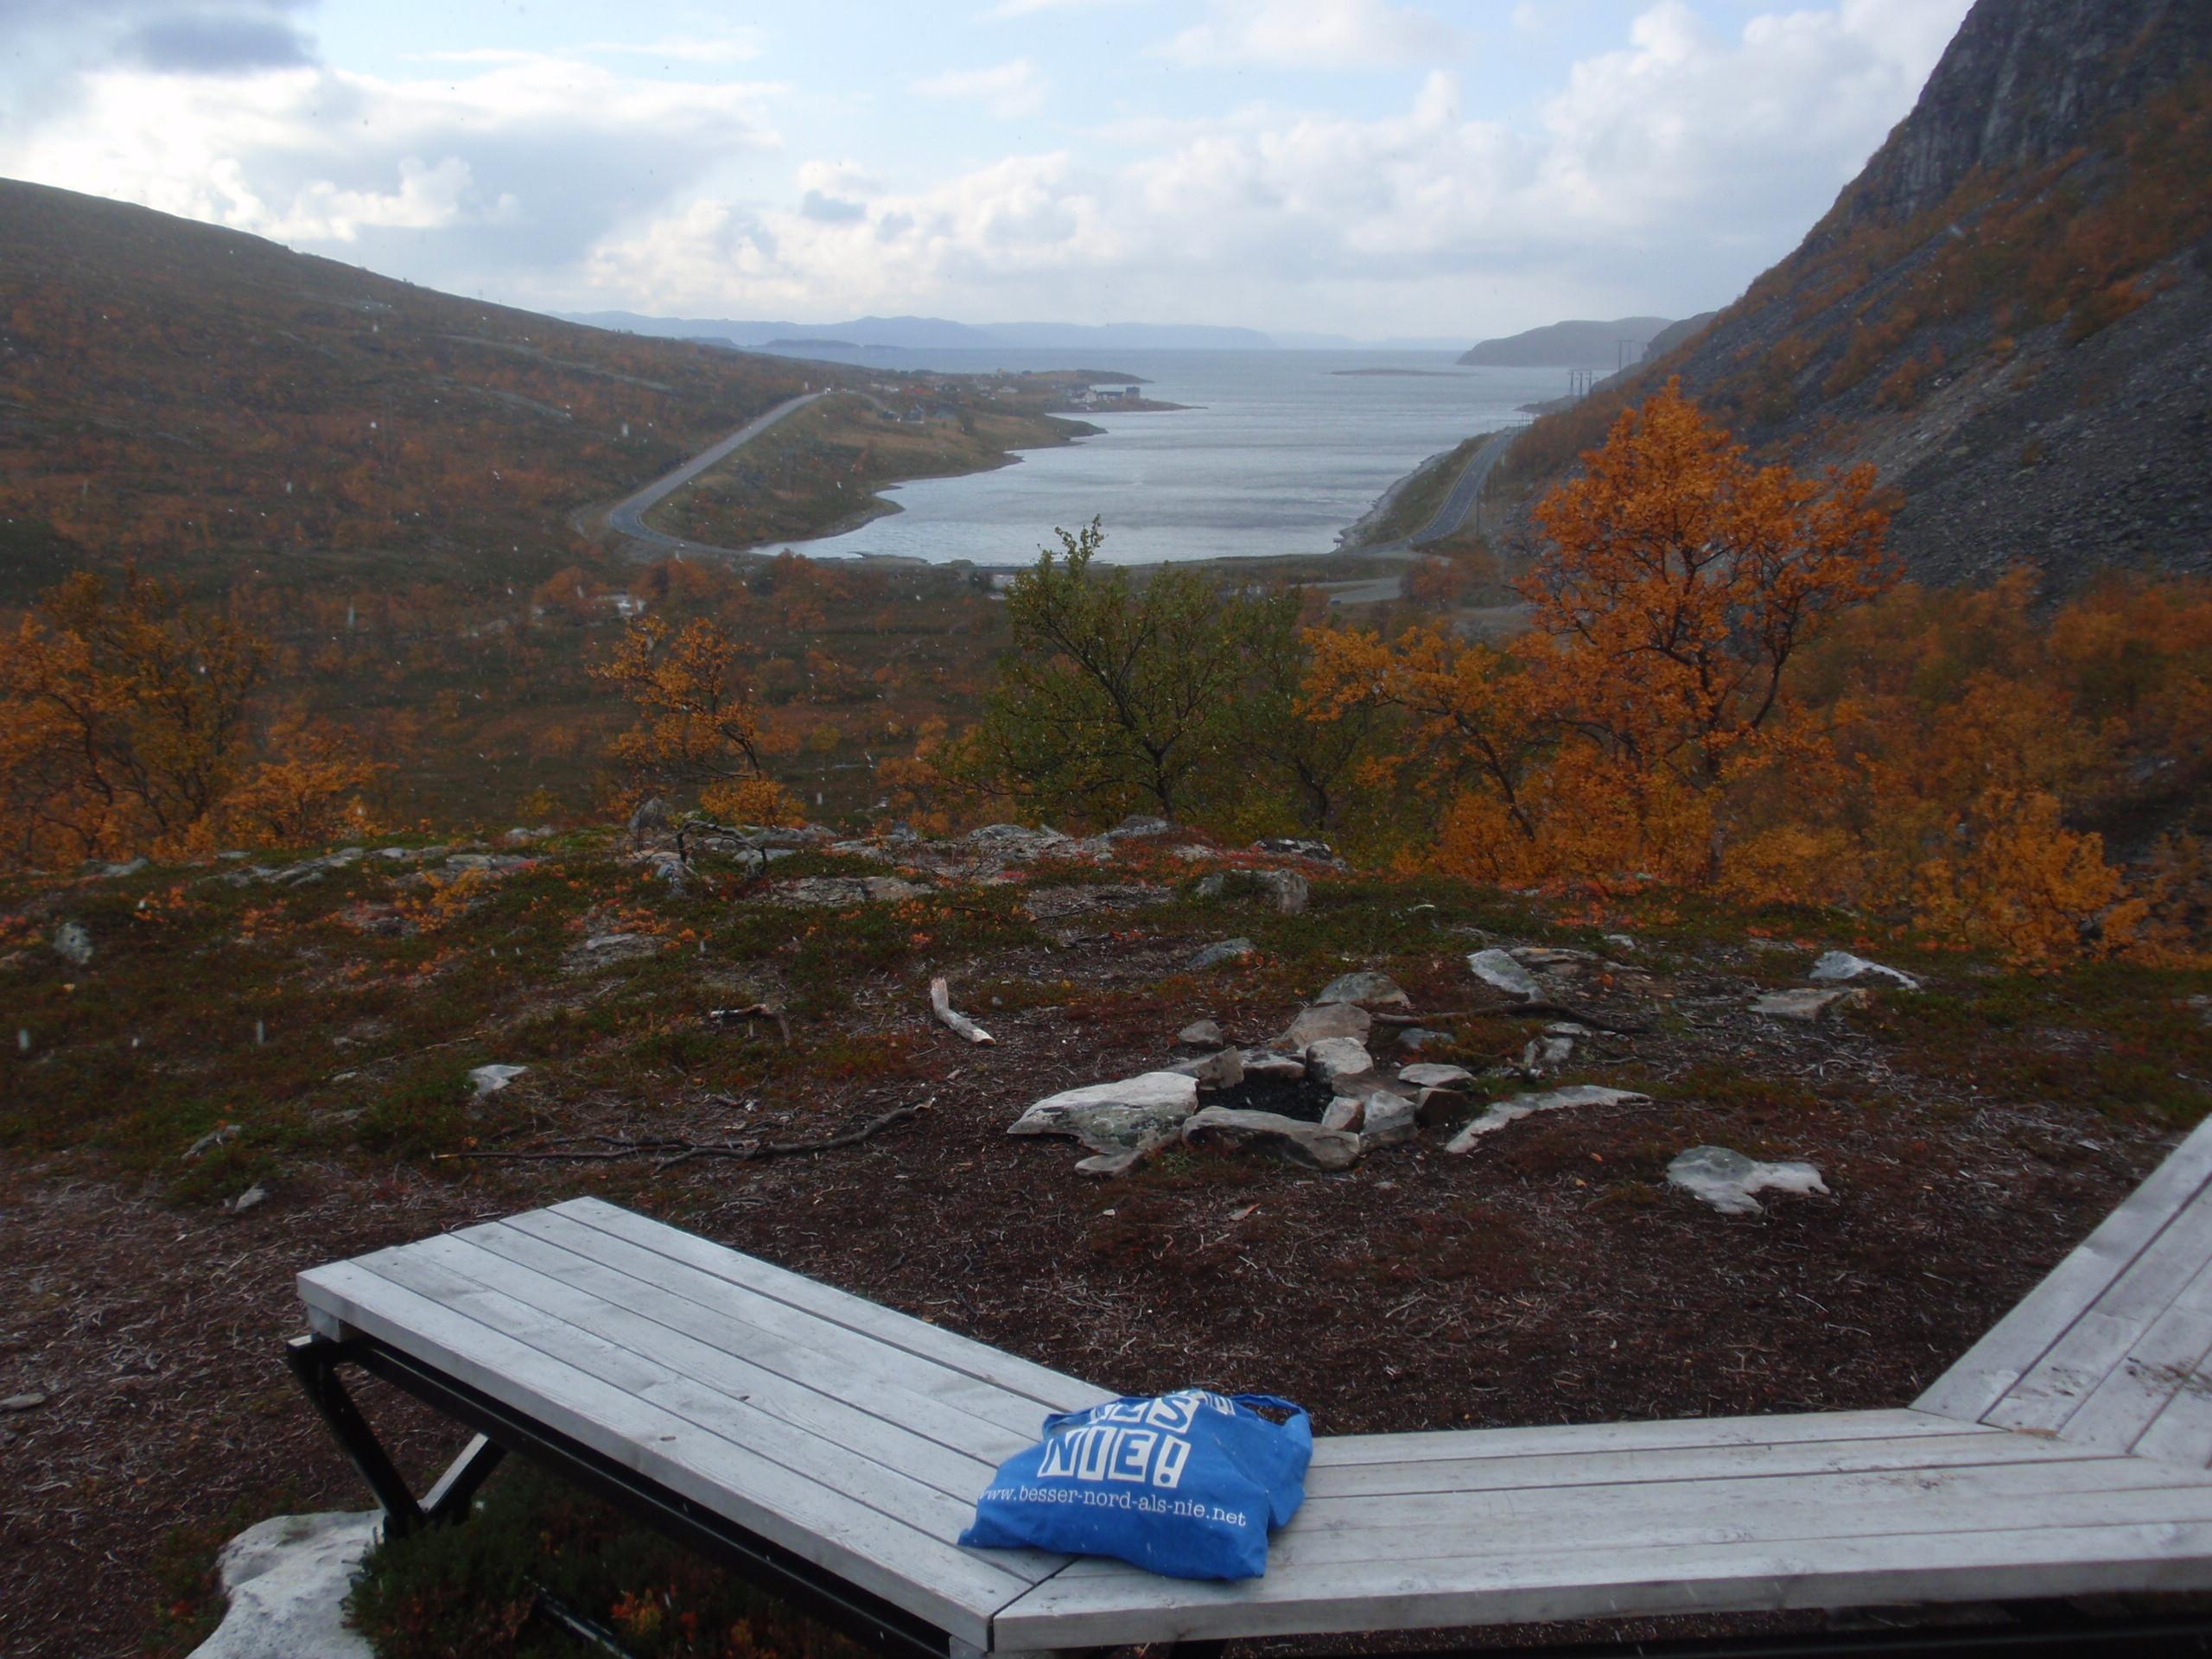 Lillefjord